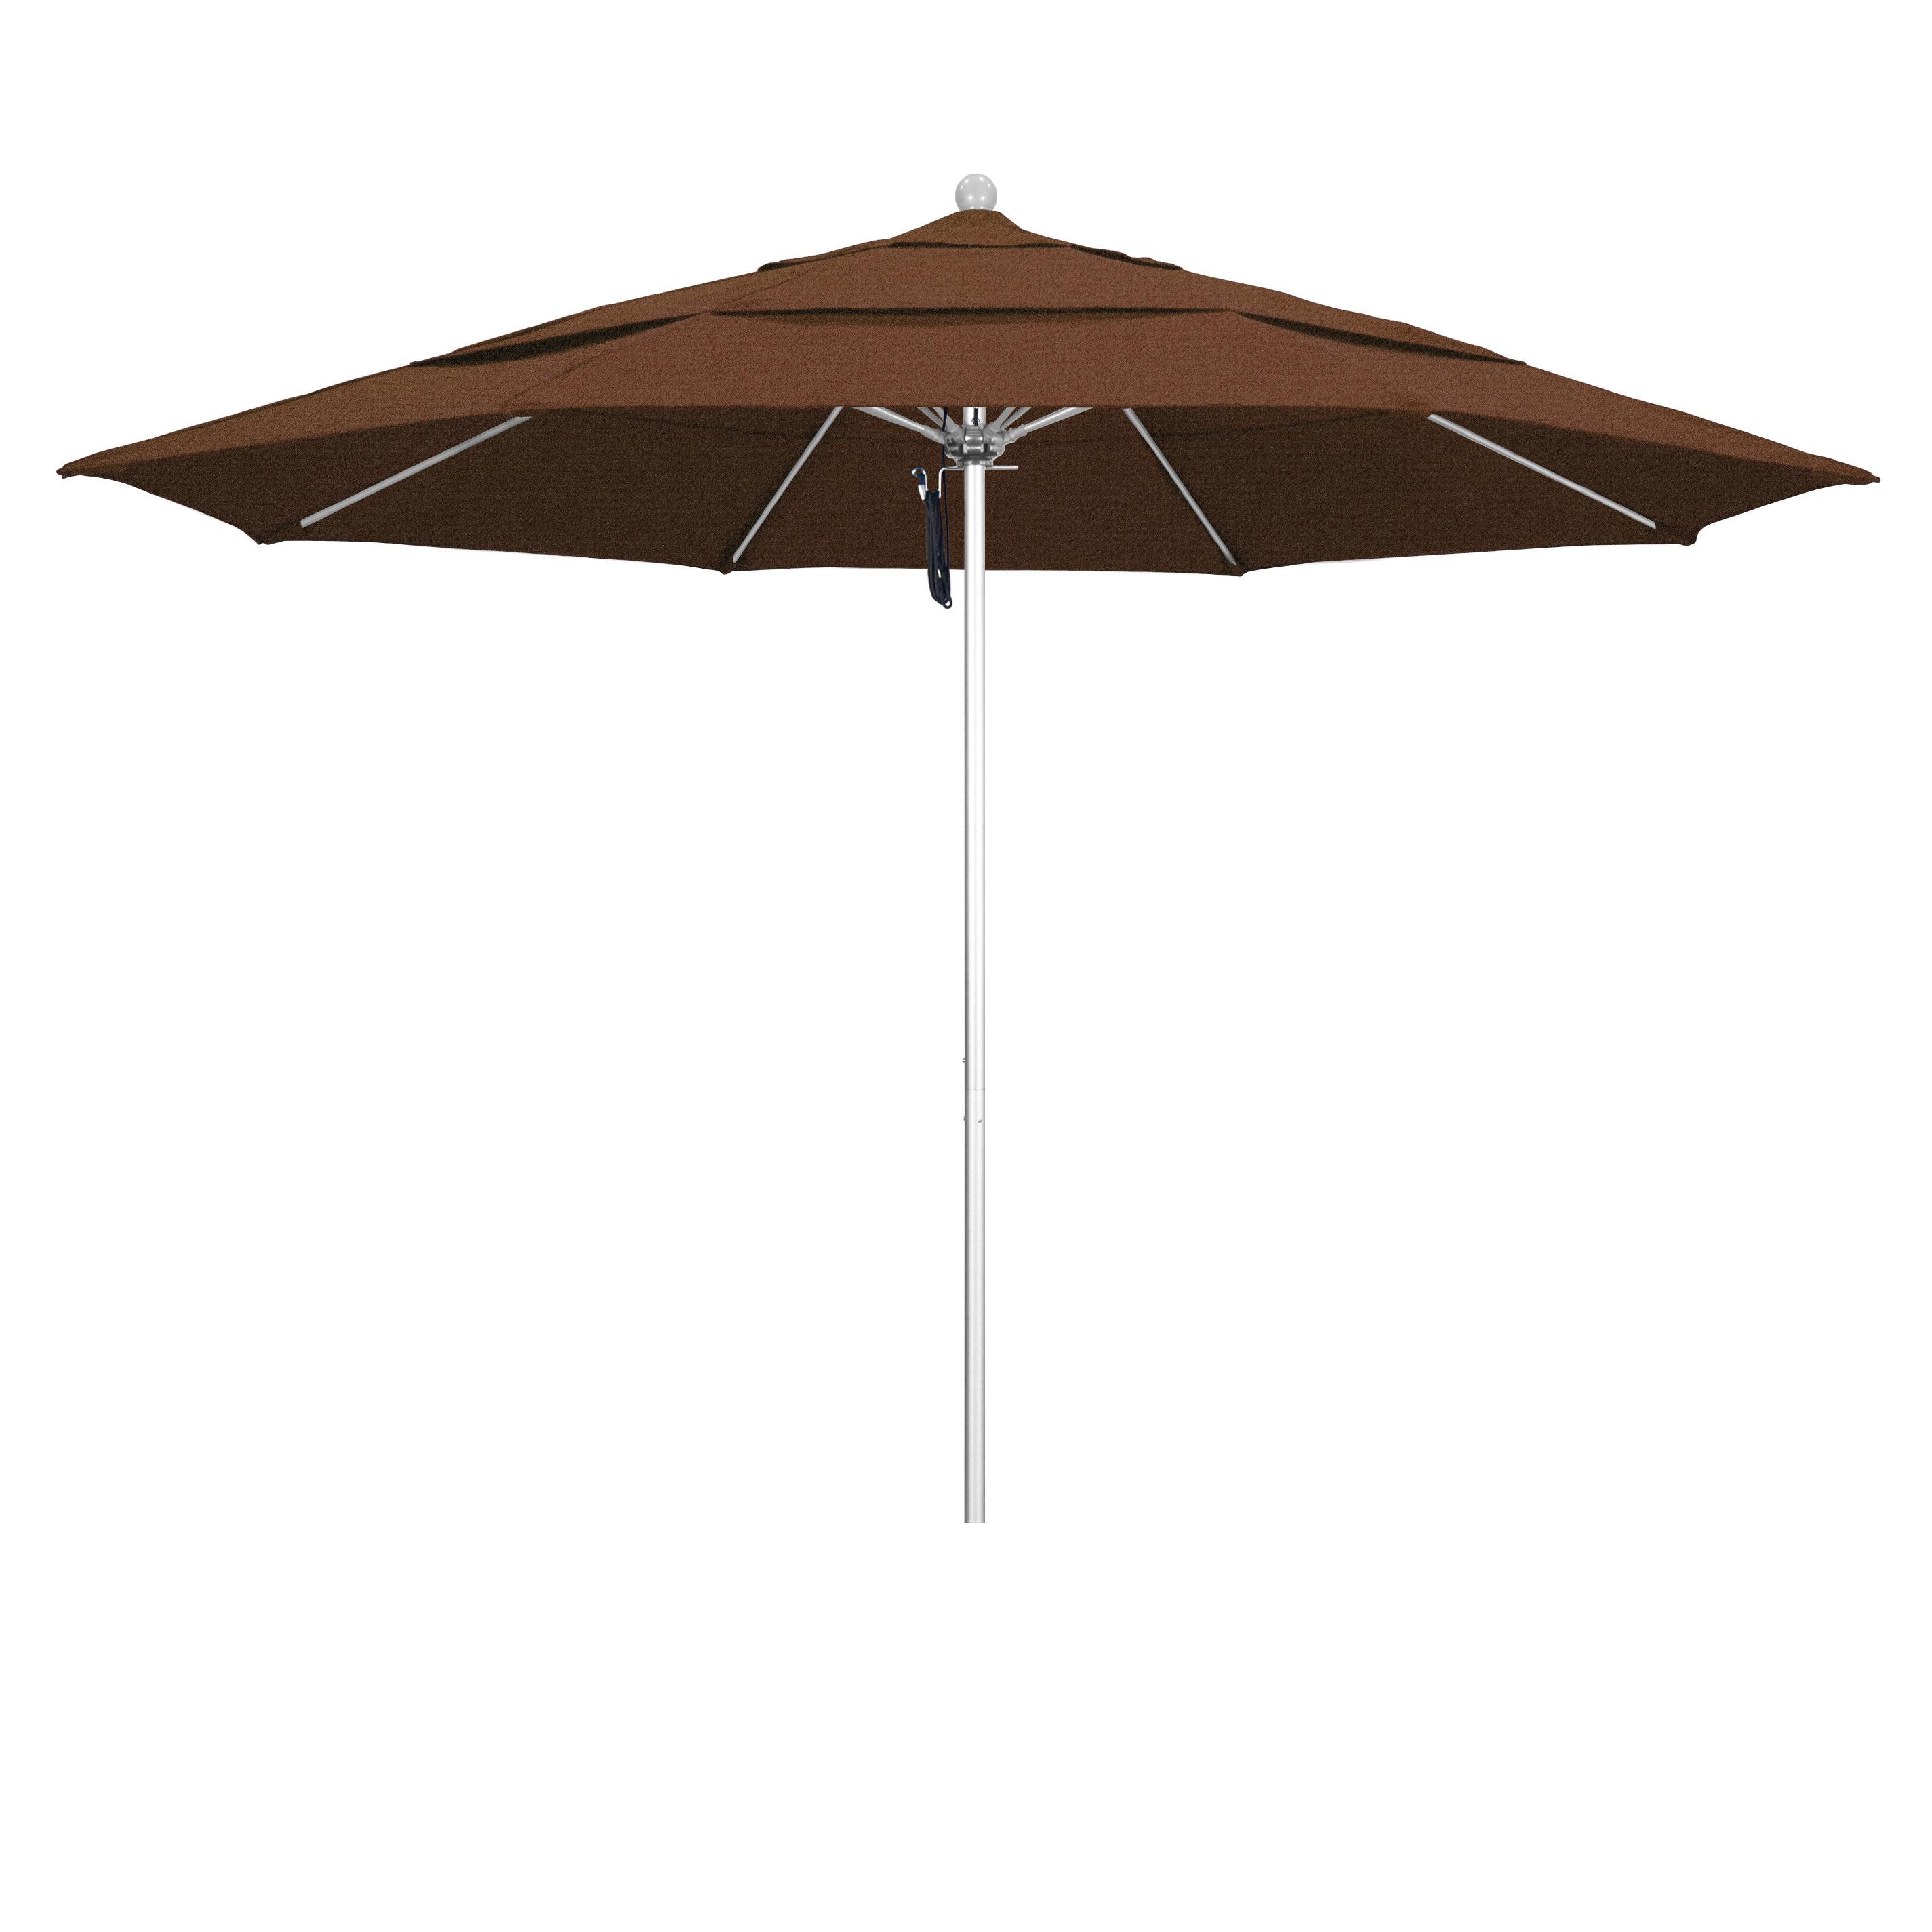 Caravelle 11' Market Umbrella With Regard To Popular Caravelle Market Umbrellas (View 3 of 20)